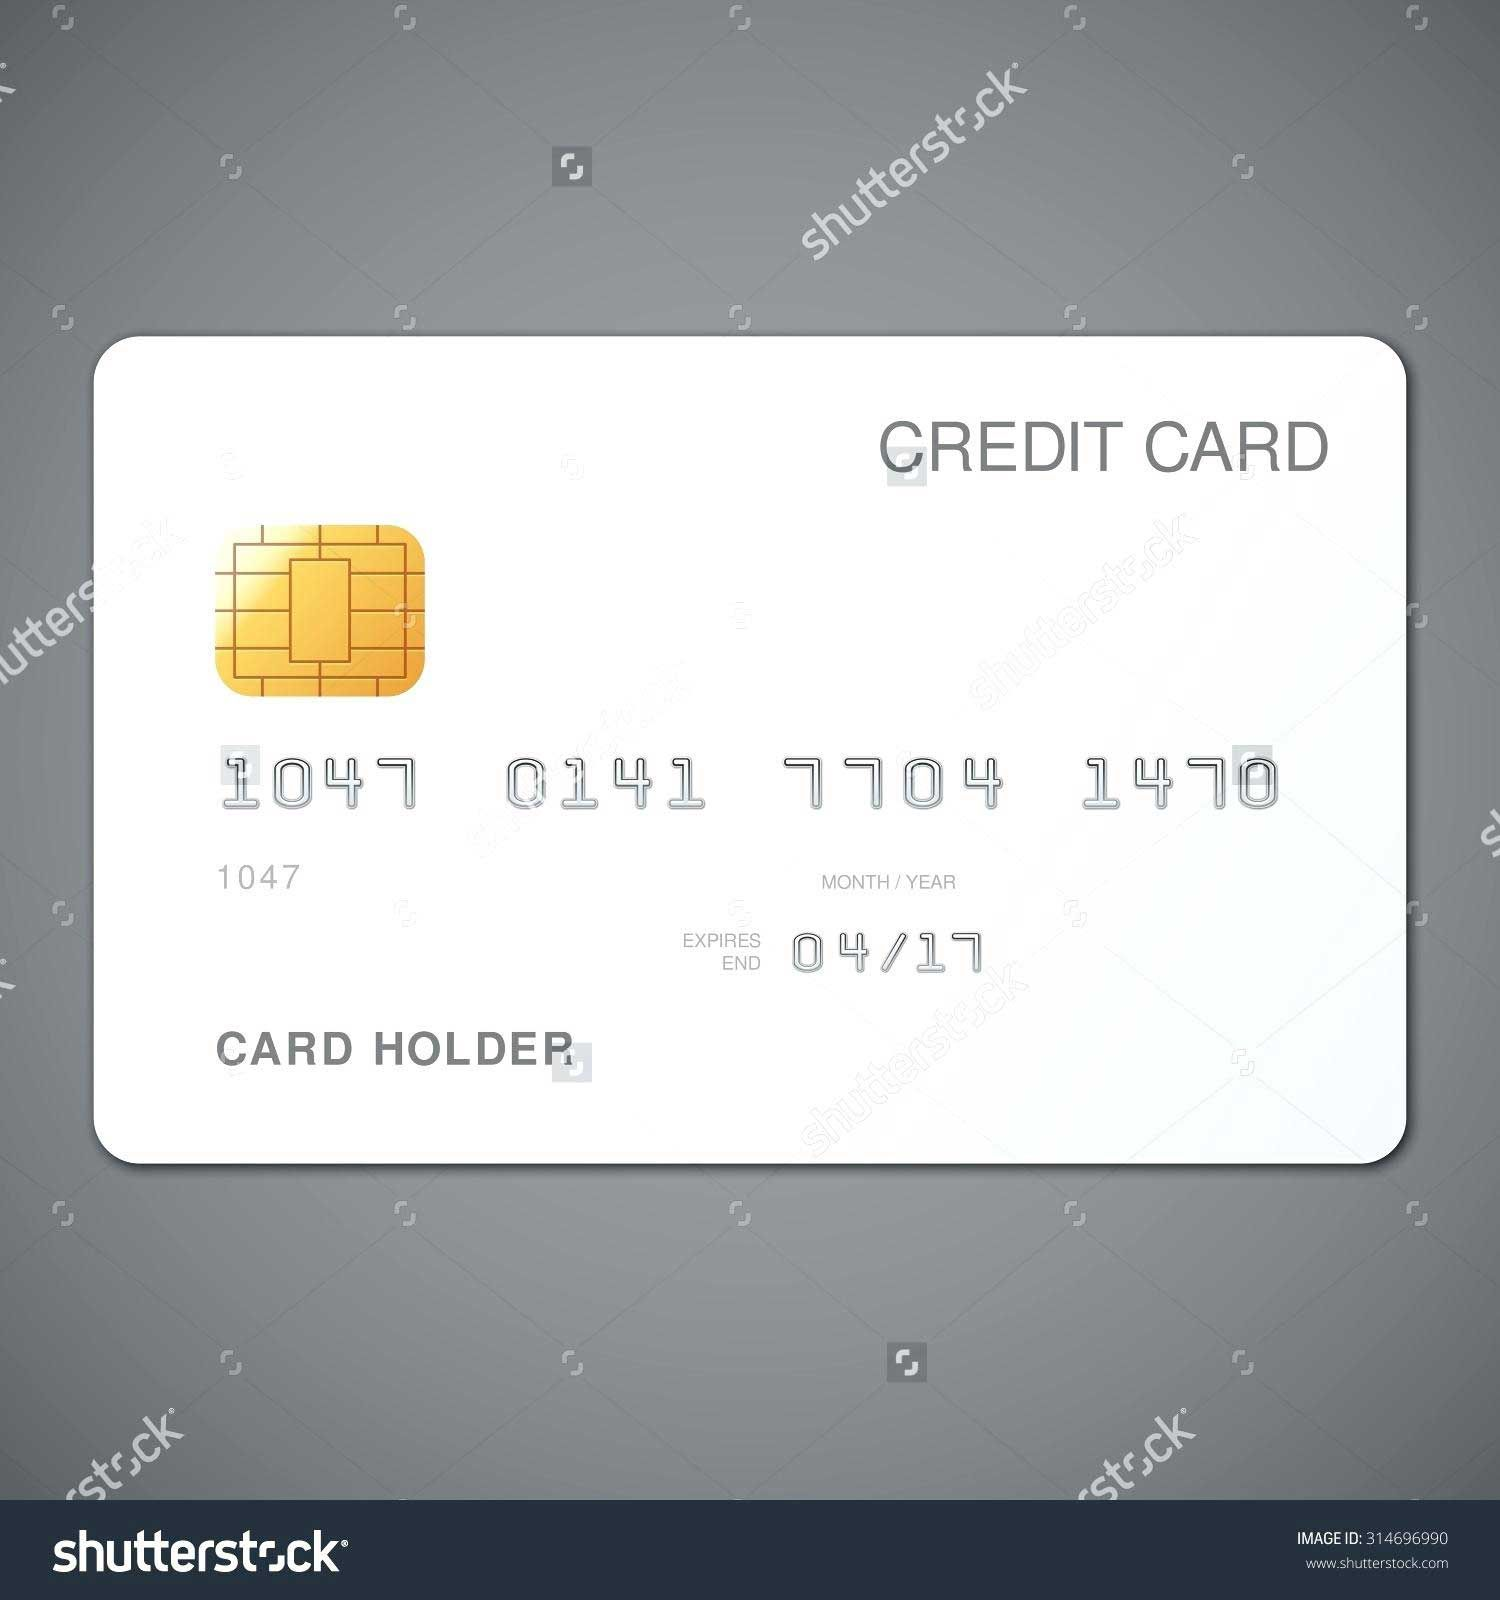 The Surprising Card Template Coreldraw 650 693 Pvc Card Template In Pvc Card Template Image Below Calling Card Template Card Template Birthday Card Template